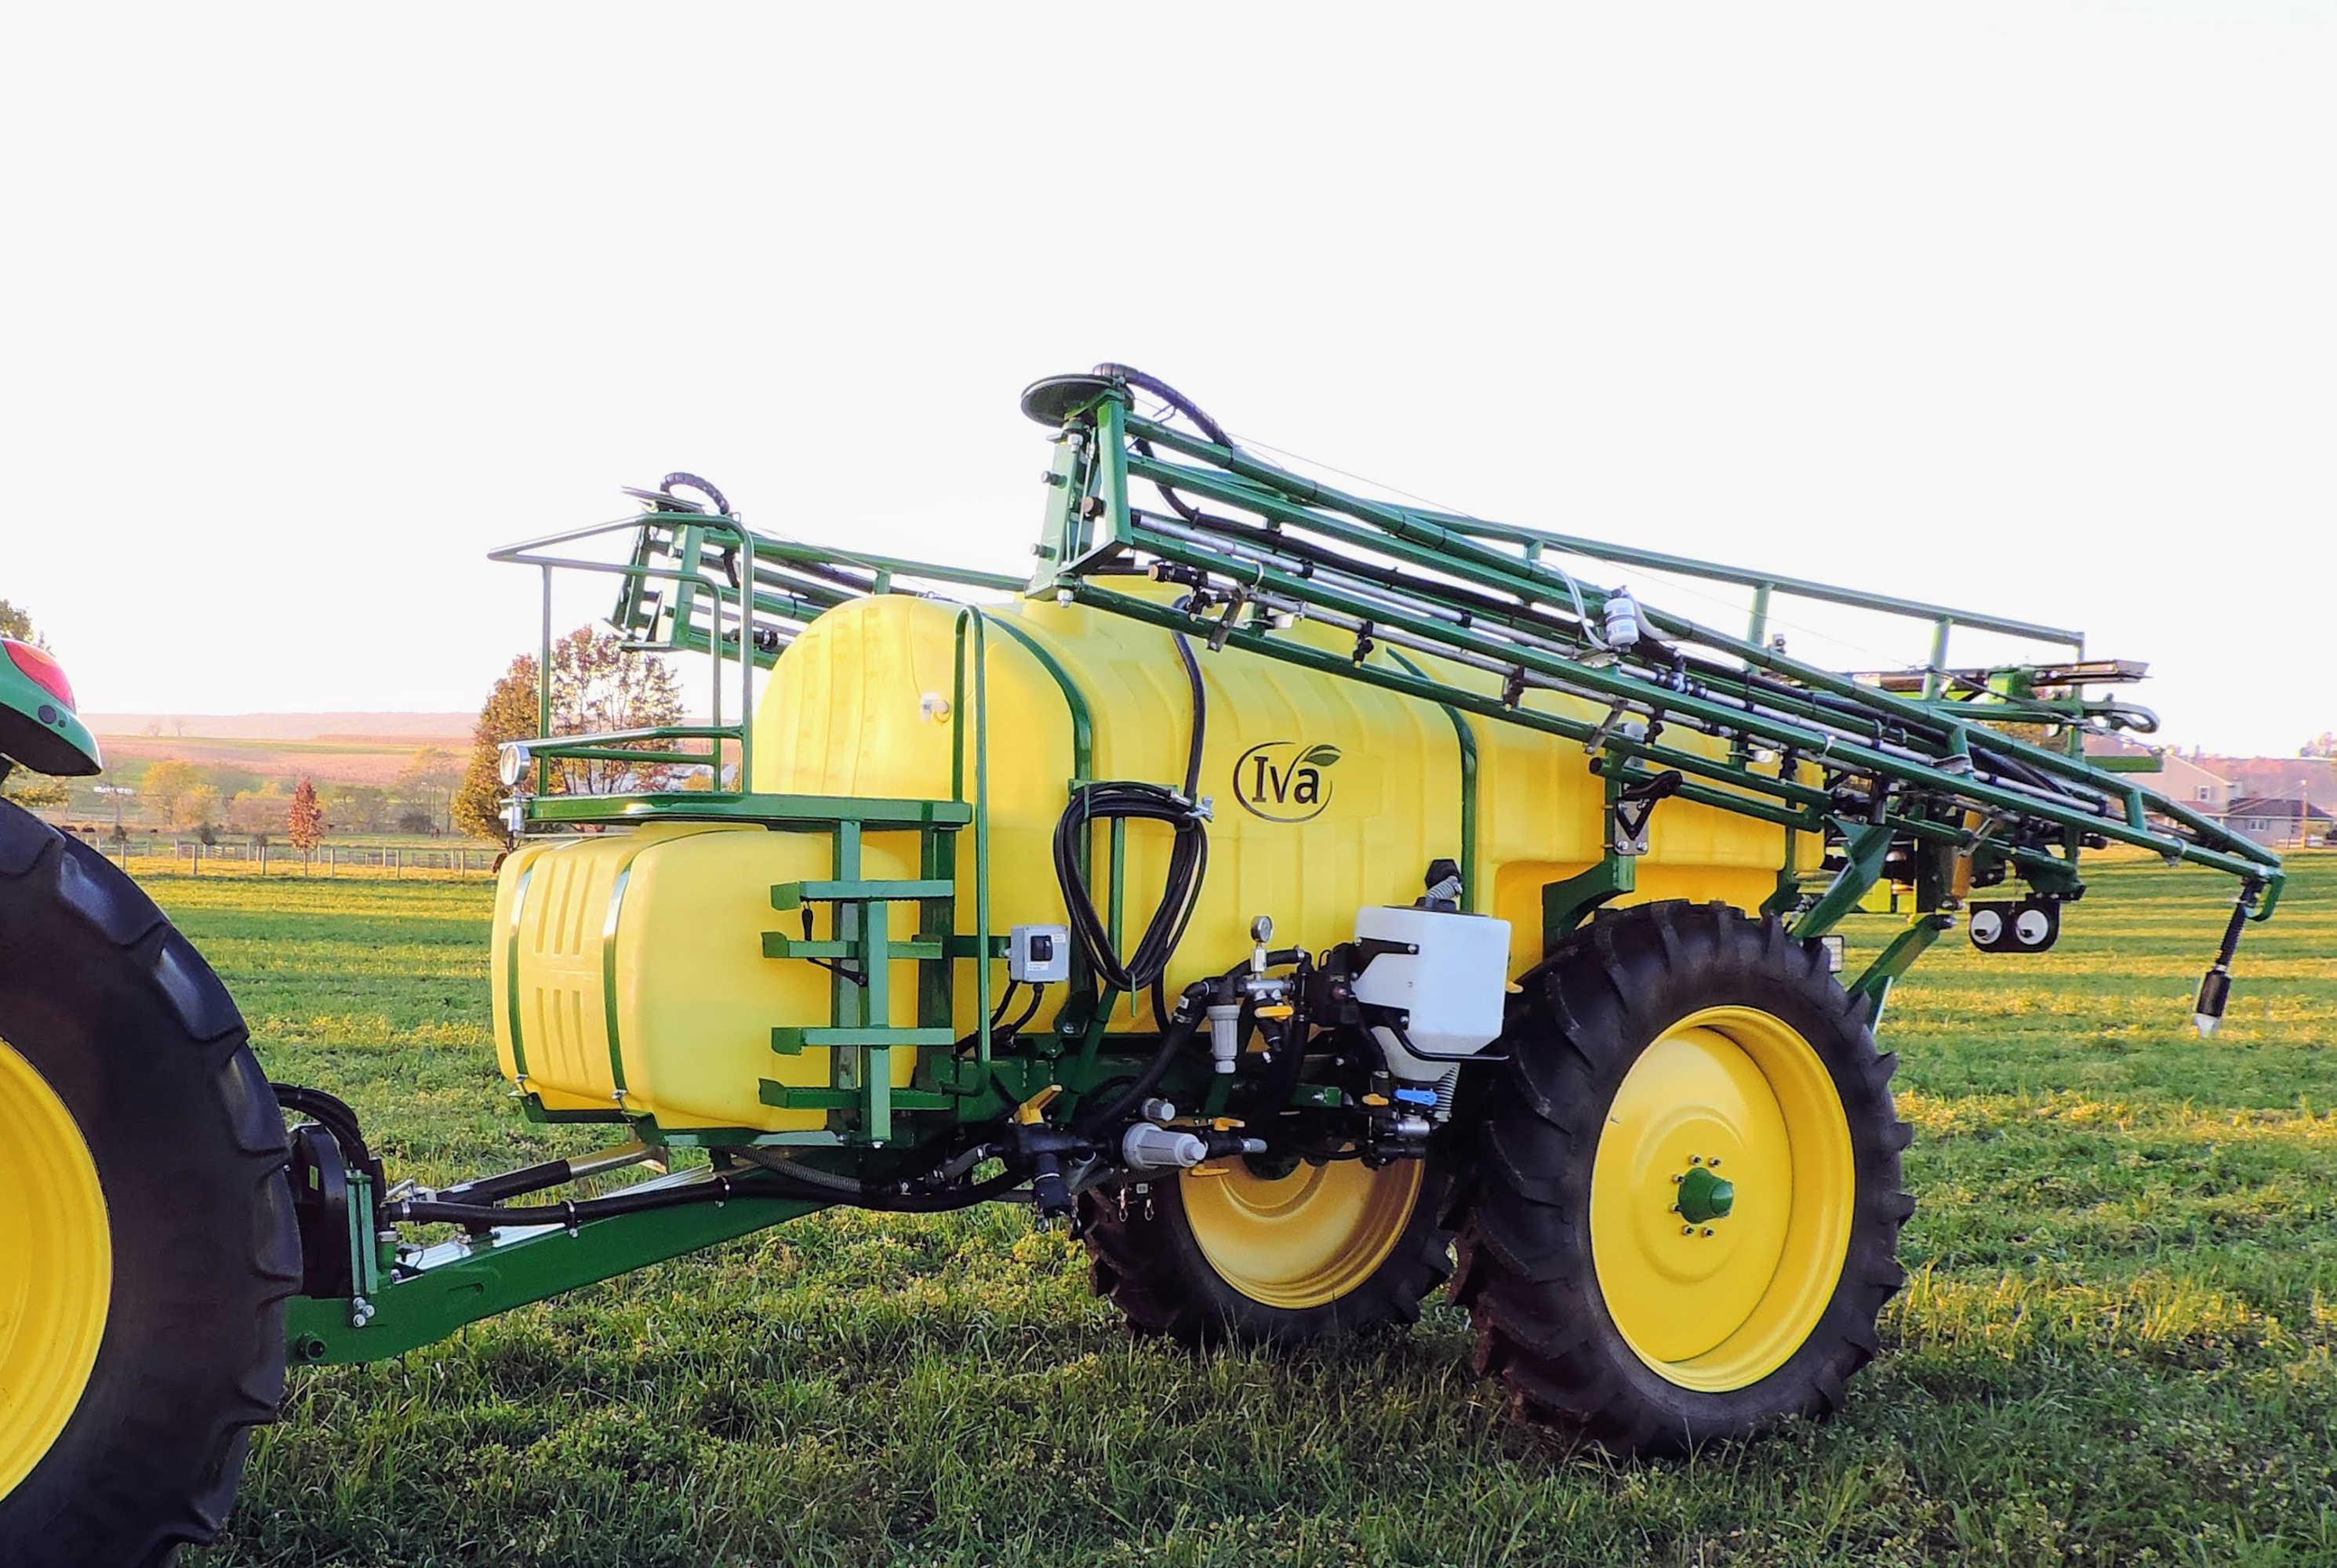 1000 gallon Trailer Field Sprayer with 60' AirRide Booms